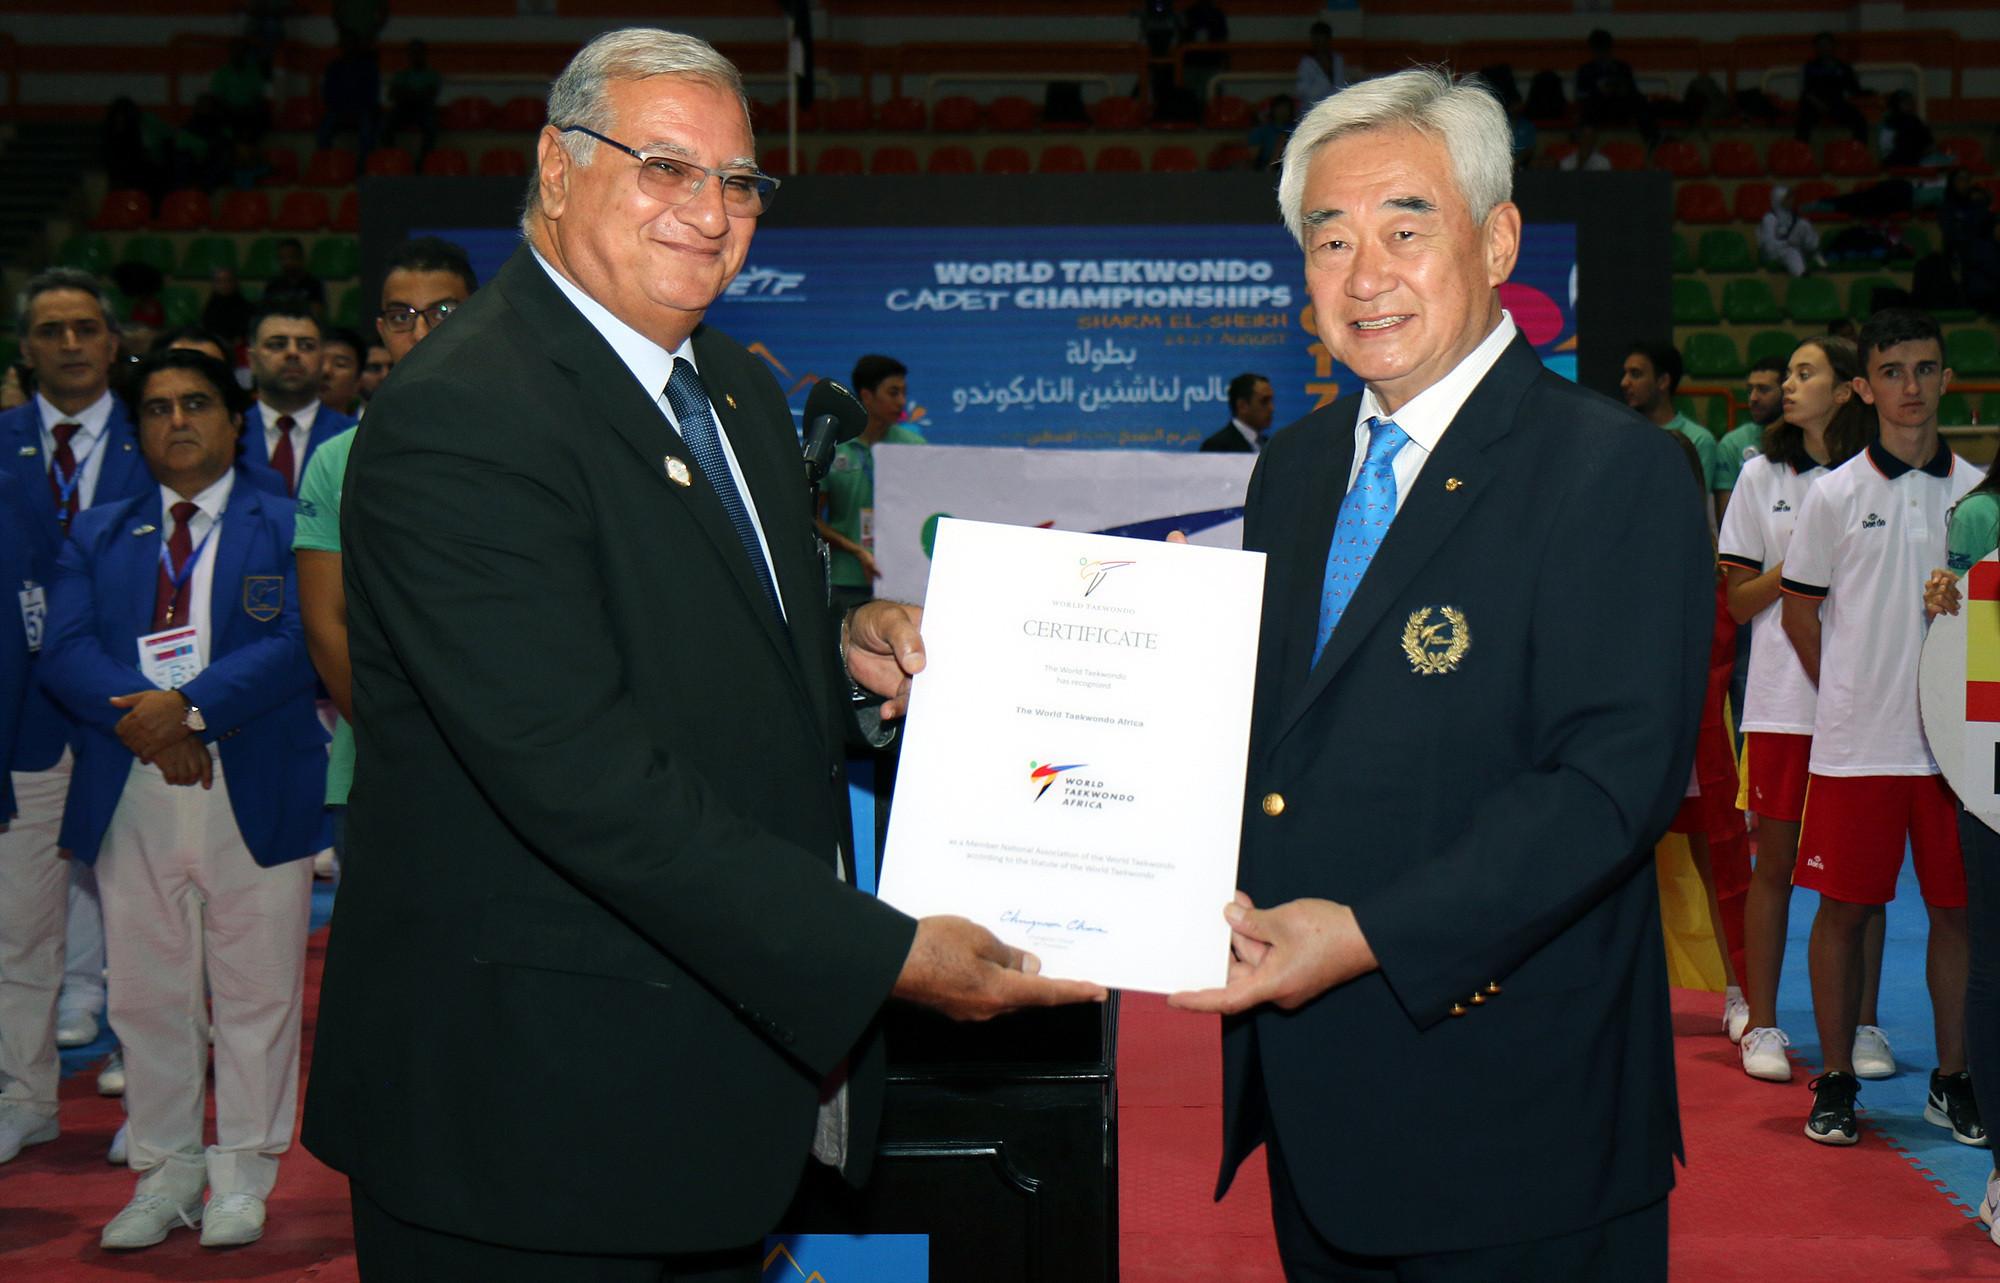 Ahmed Fouly joined the World Taekwondo Council in 2001 ©World Taekwondo